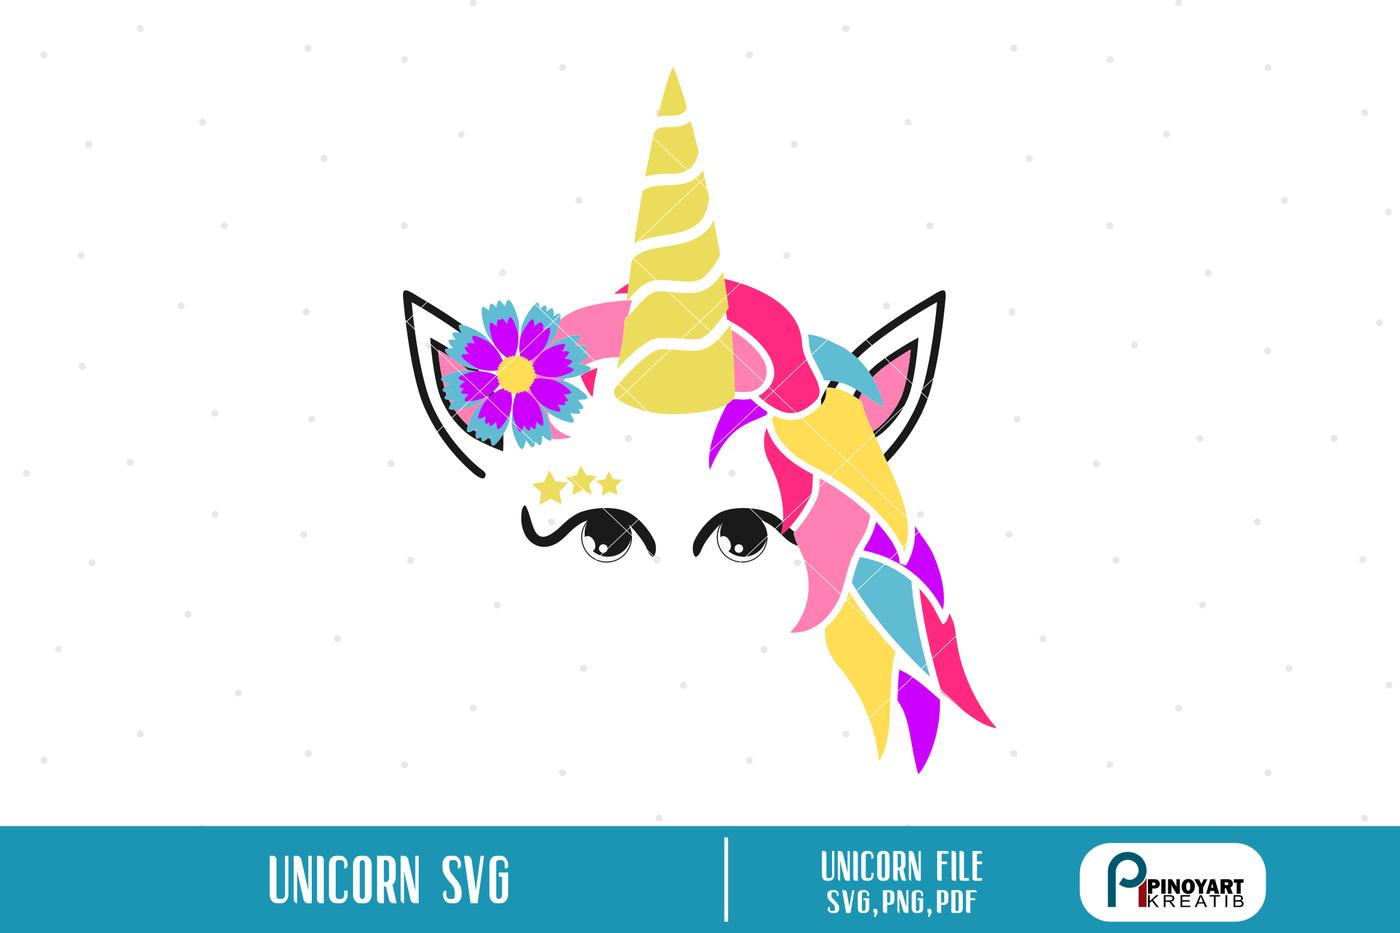 Unicorn Svg Unicorn Svg File Unicorn Png File Unicorn Head Svg Svg